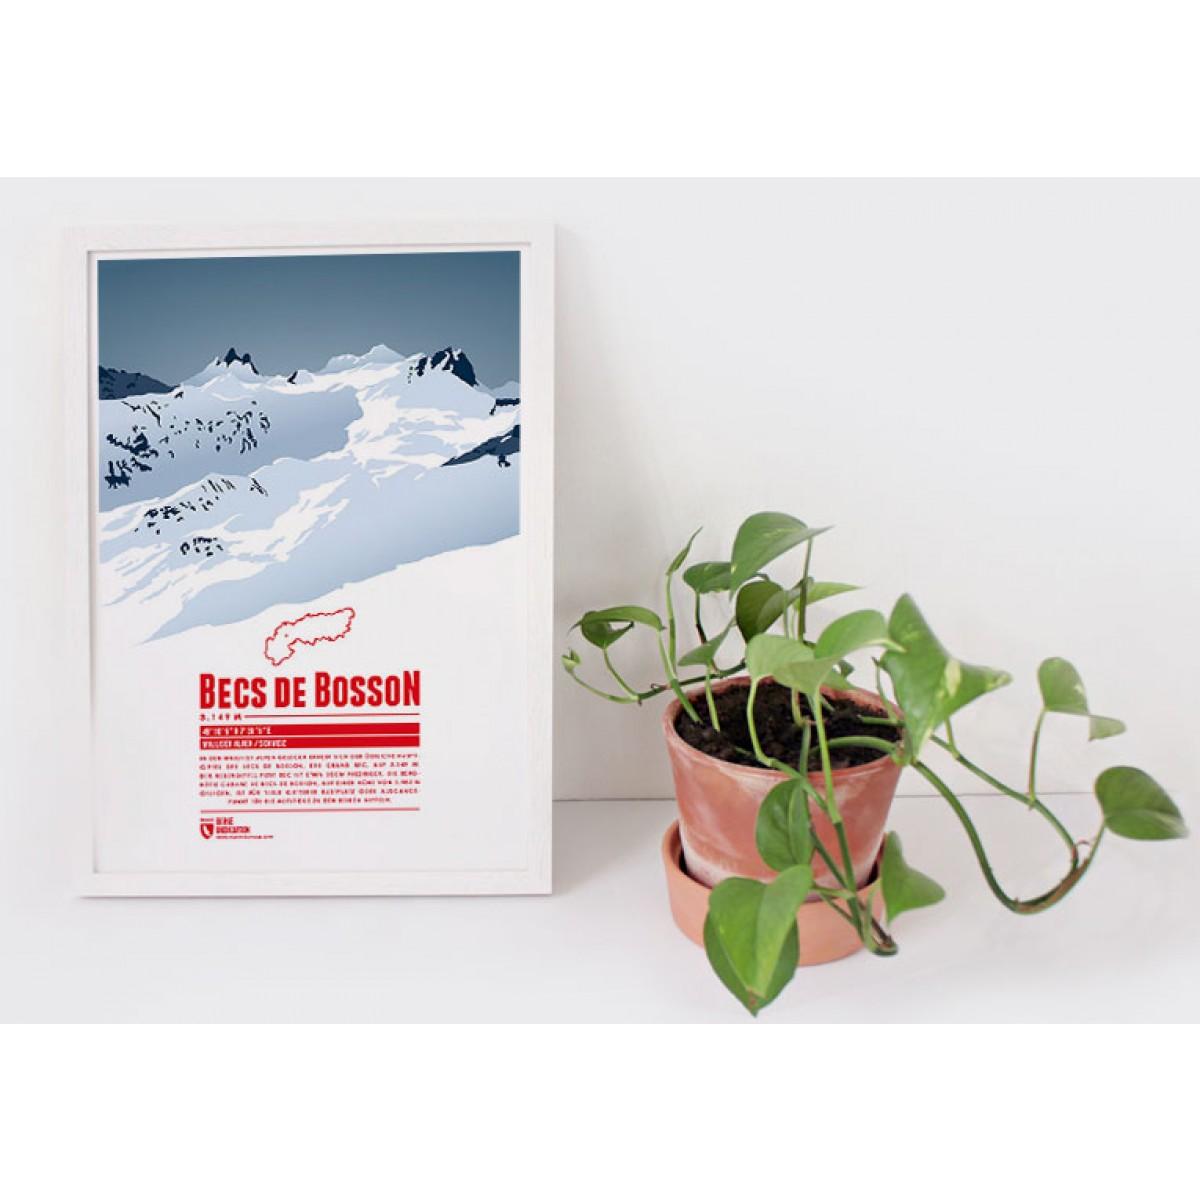 Becs de Bosson - Bergdruck